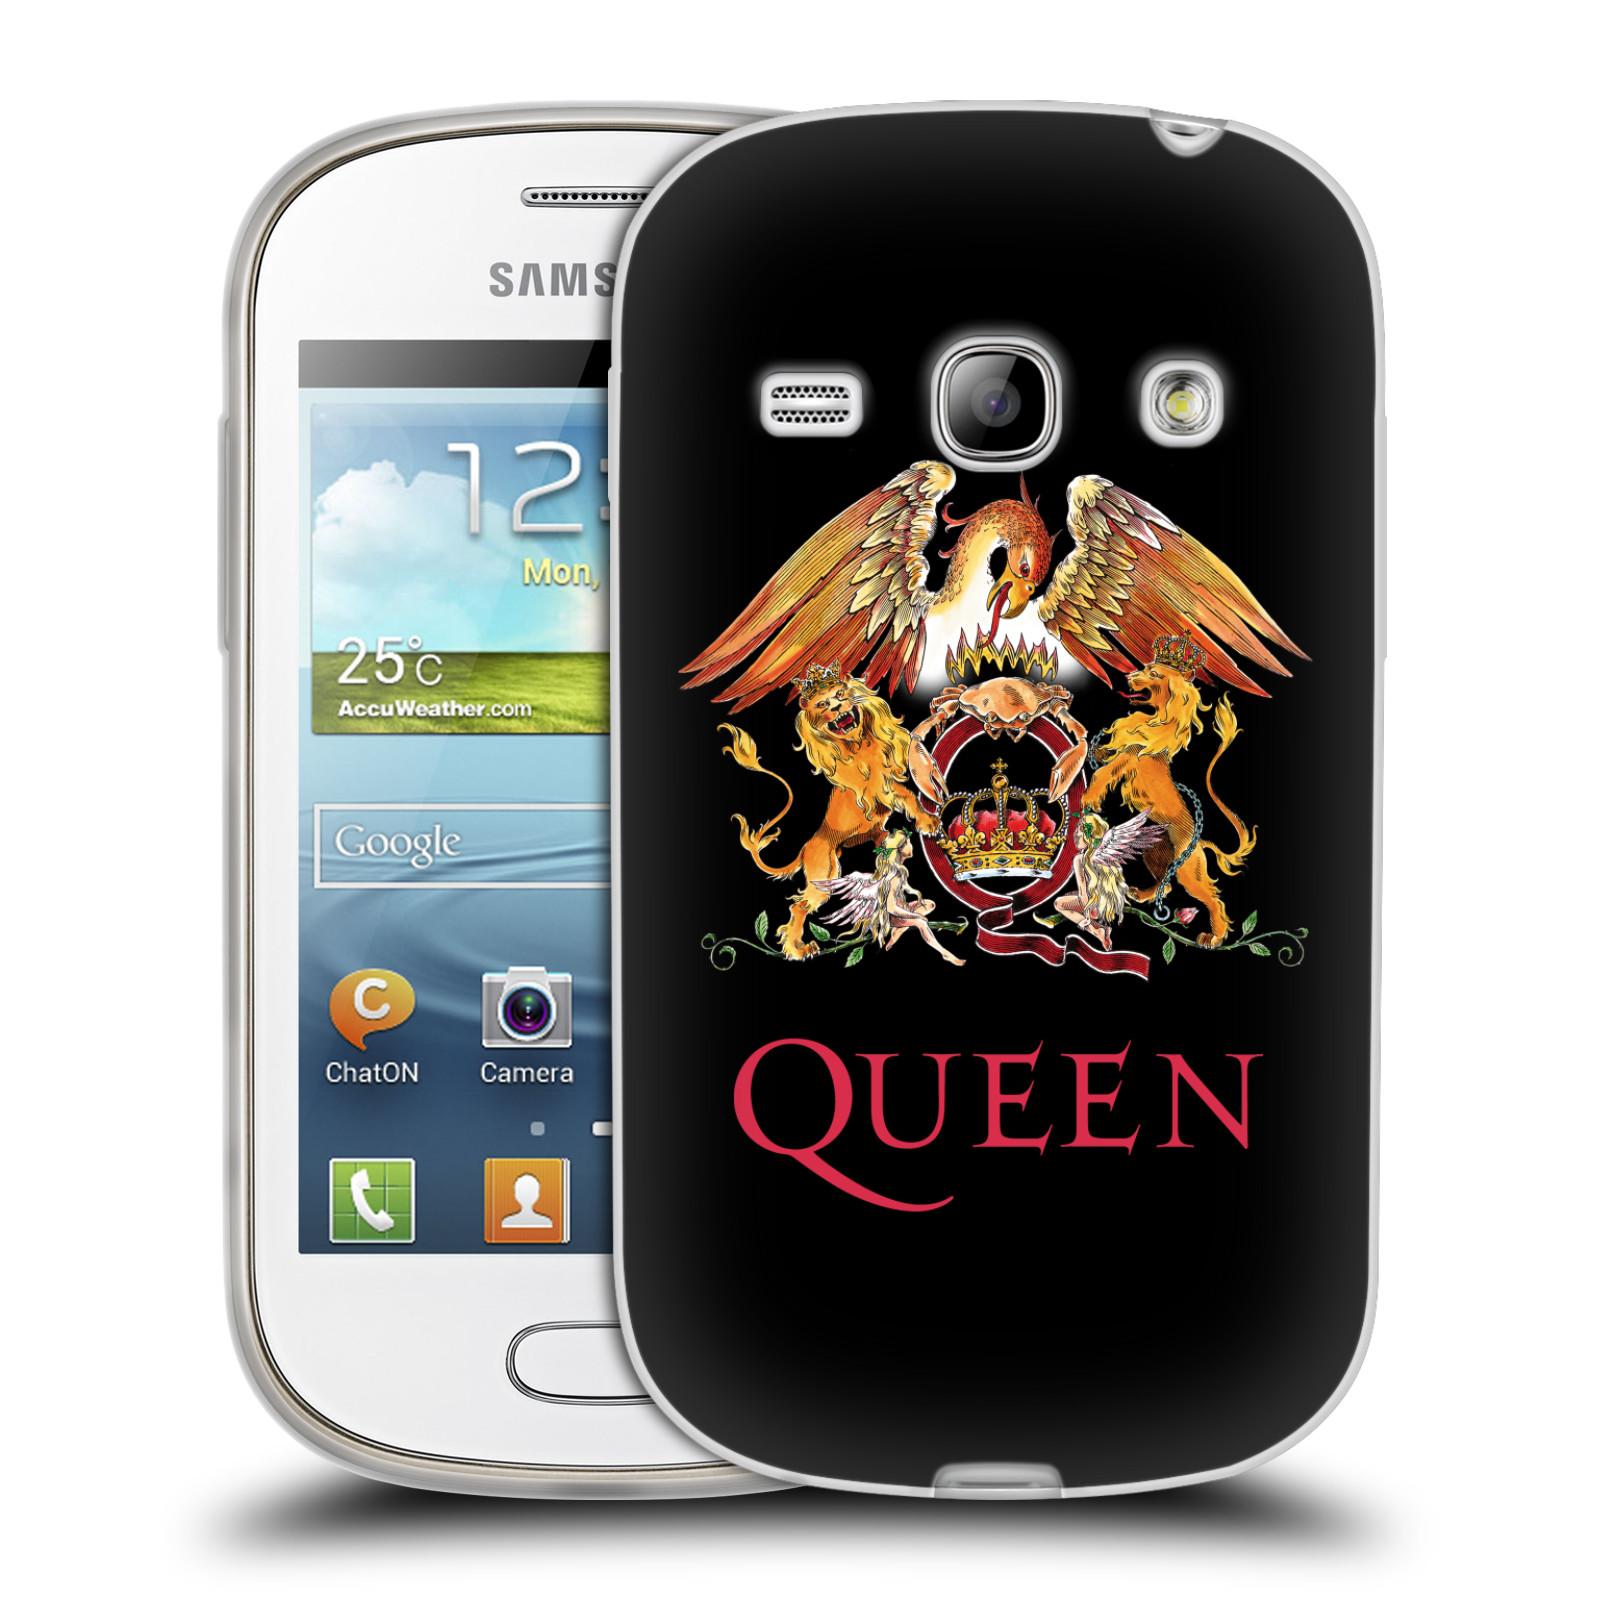 Silikonové pouzdro na mobil Samsung Galaxy Fame HEAD CASE Queen - Logo (Silikonový kryt či obal na mobilní telefon licencovaným motivem Queen pro Samsung Galaxy Fame GT-S6810)